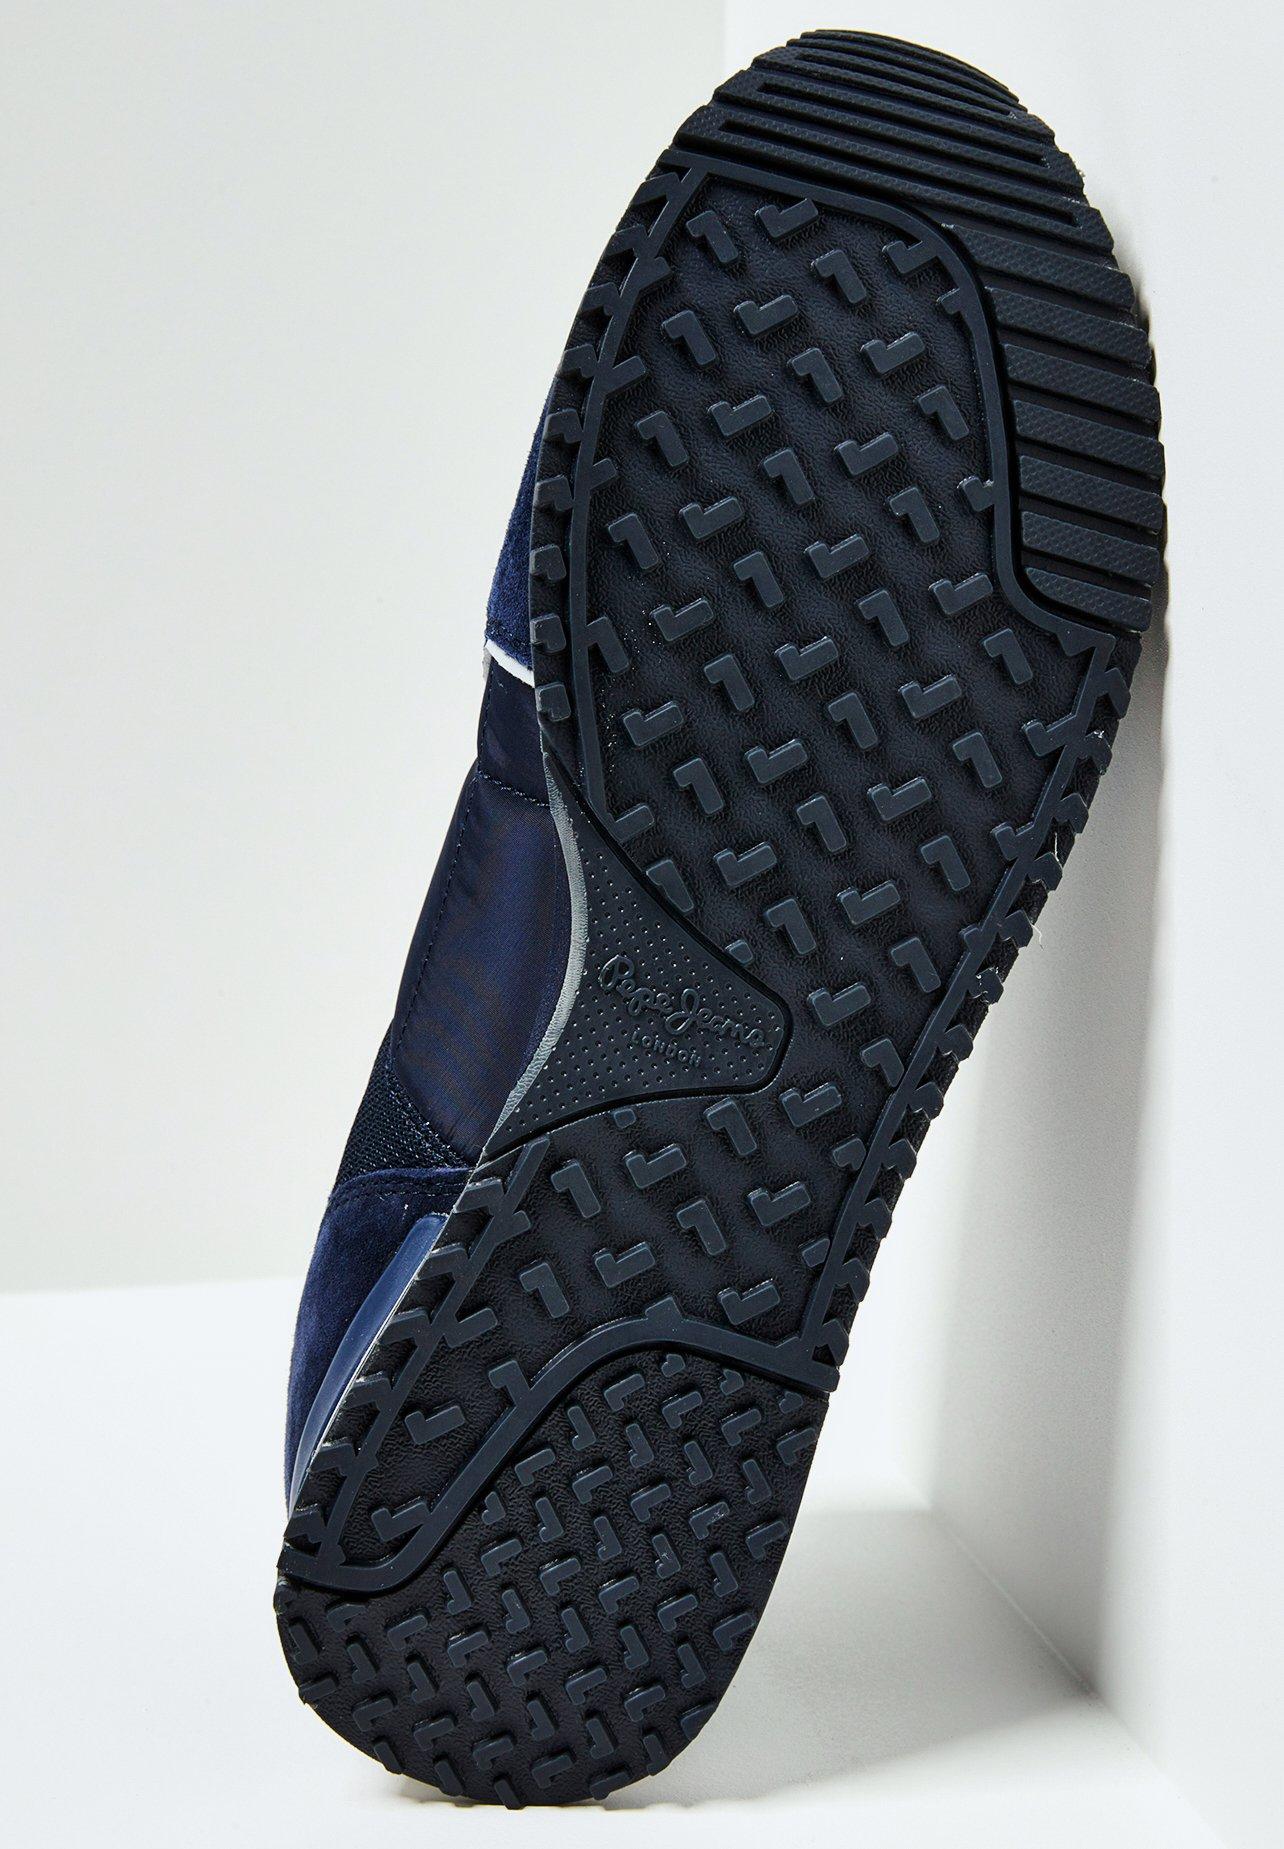 Pepe Jeans TINKER CITY - Snörskor - azul marino/mörkblå - Herrskor vNZxg